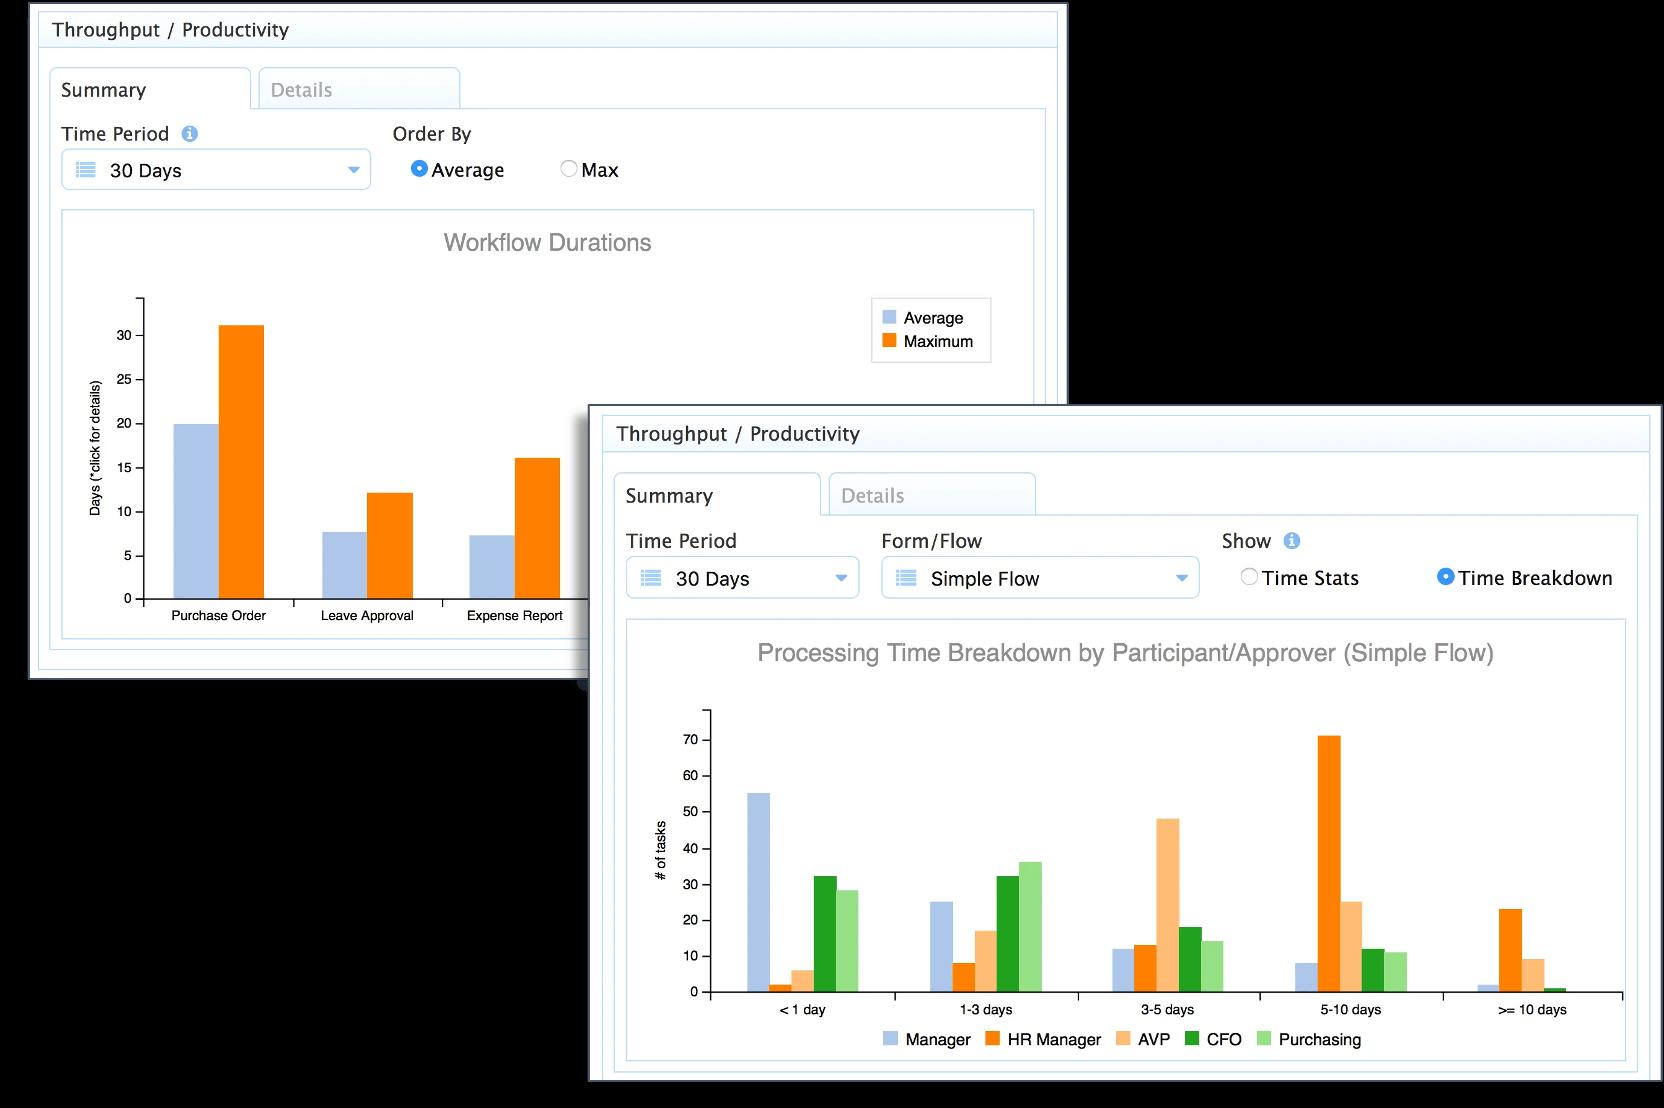 frevvo's analytics dashboard showing throughput/productivity